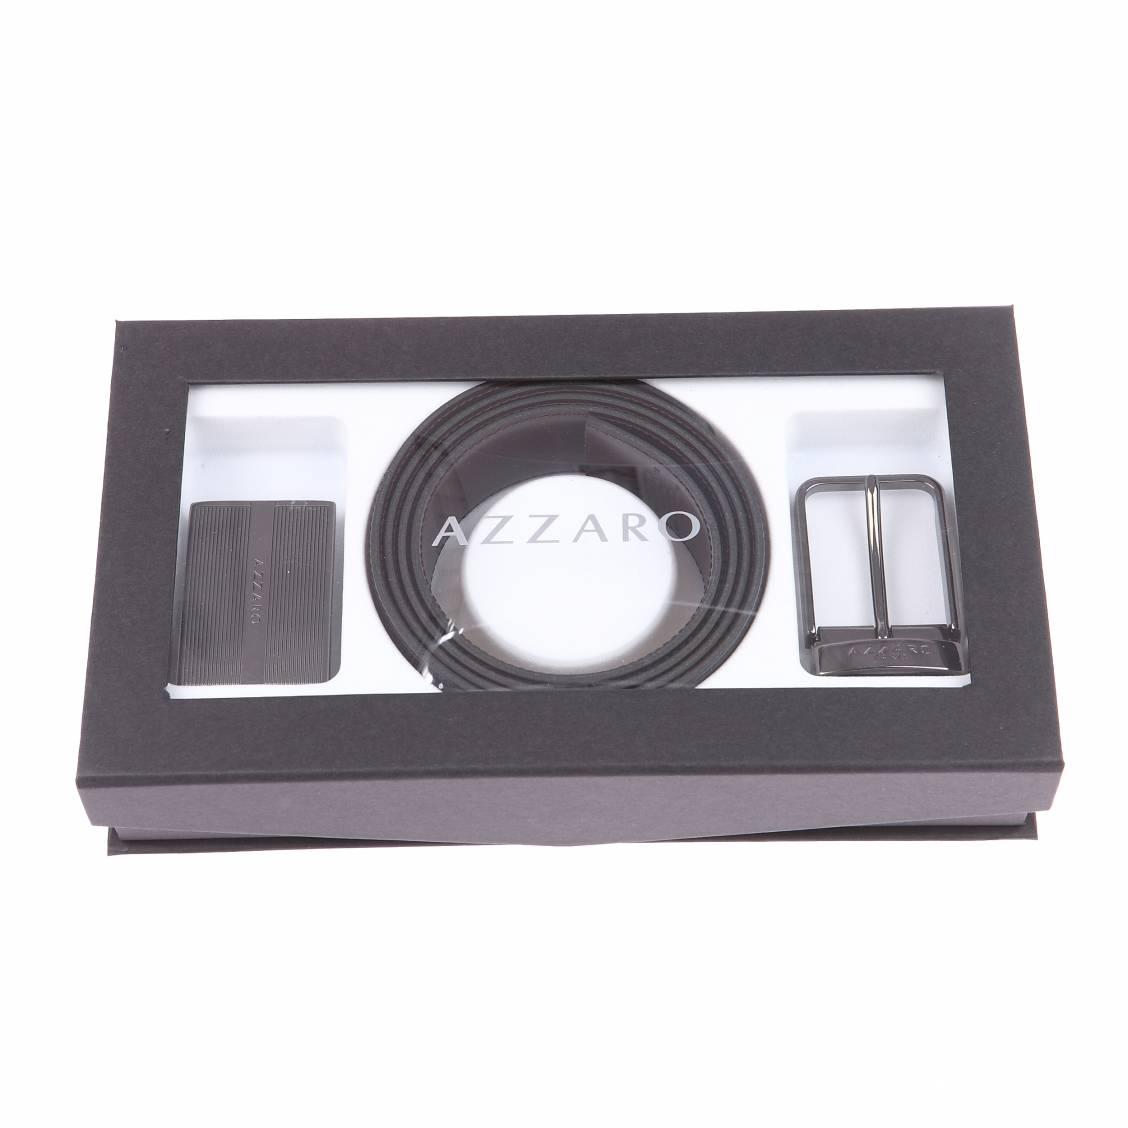 0935b21df10 Coffret cadeau   ceinture Azzaro ajustable